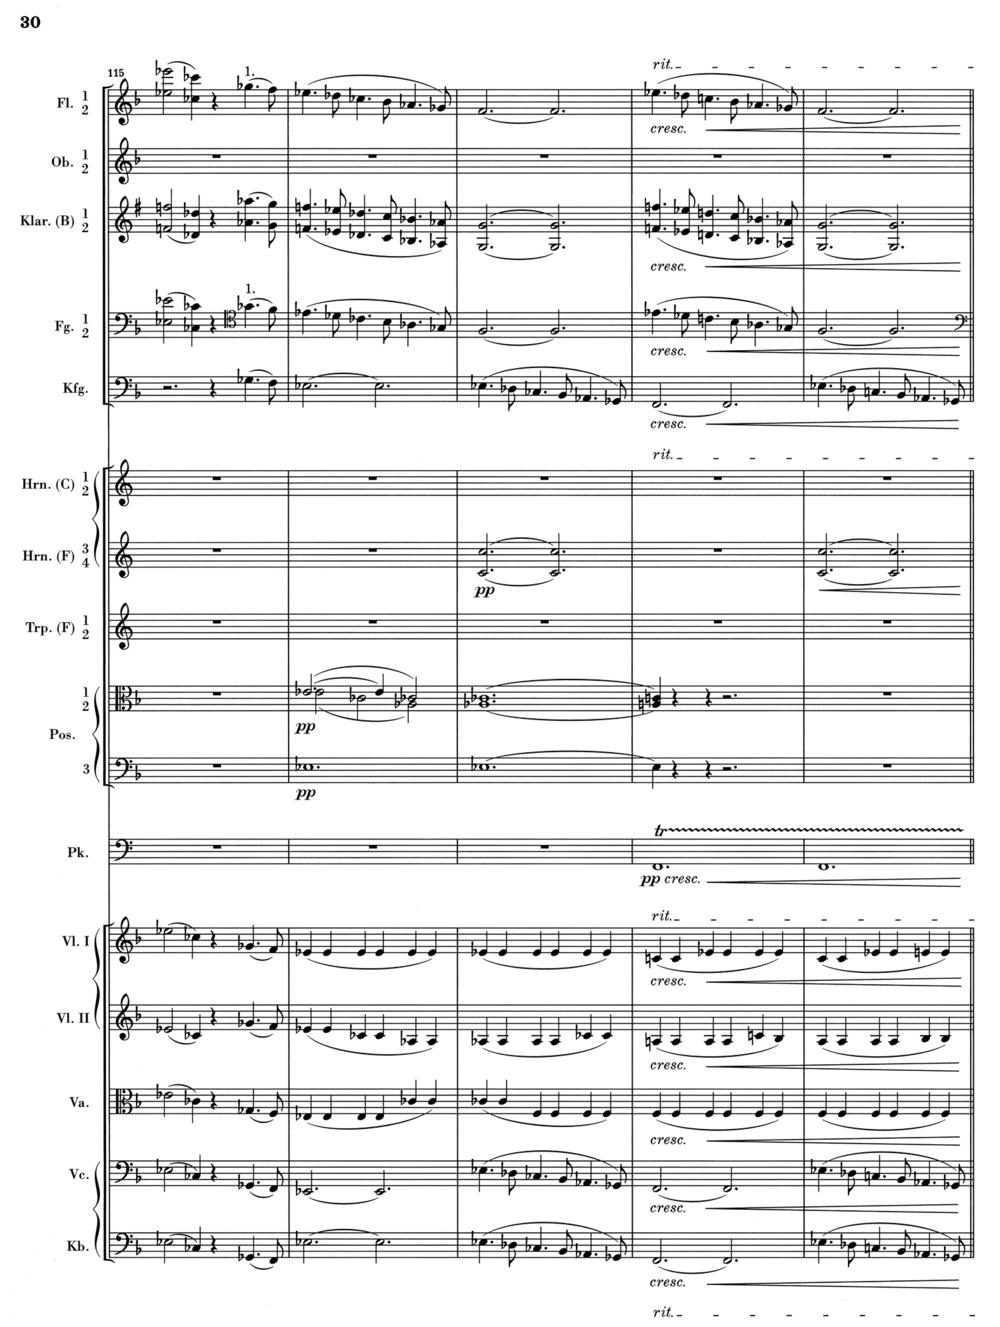 Brahms 3 Score 5.jpg